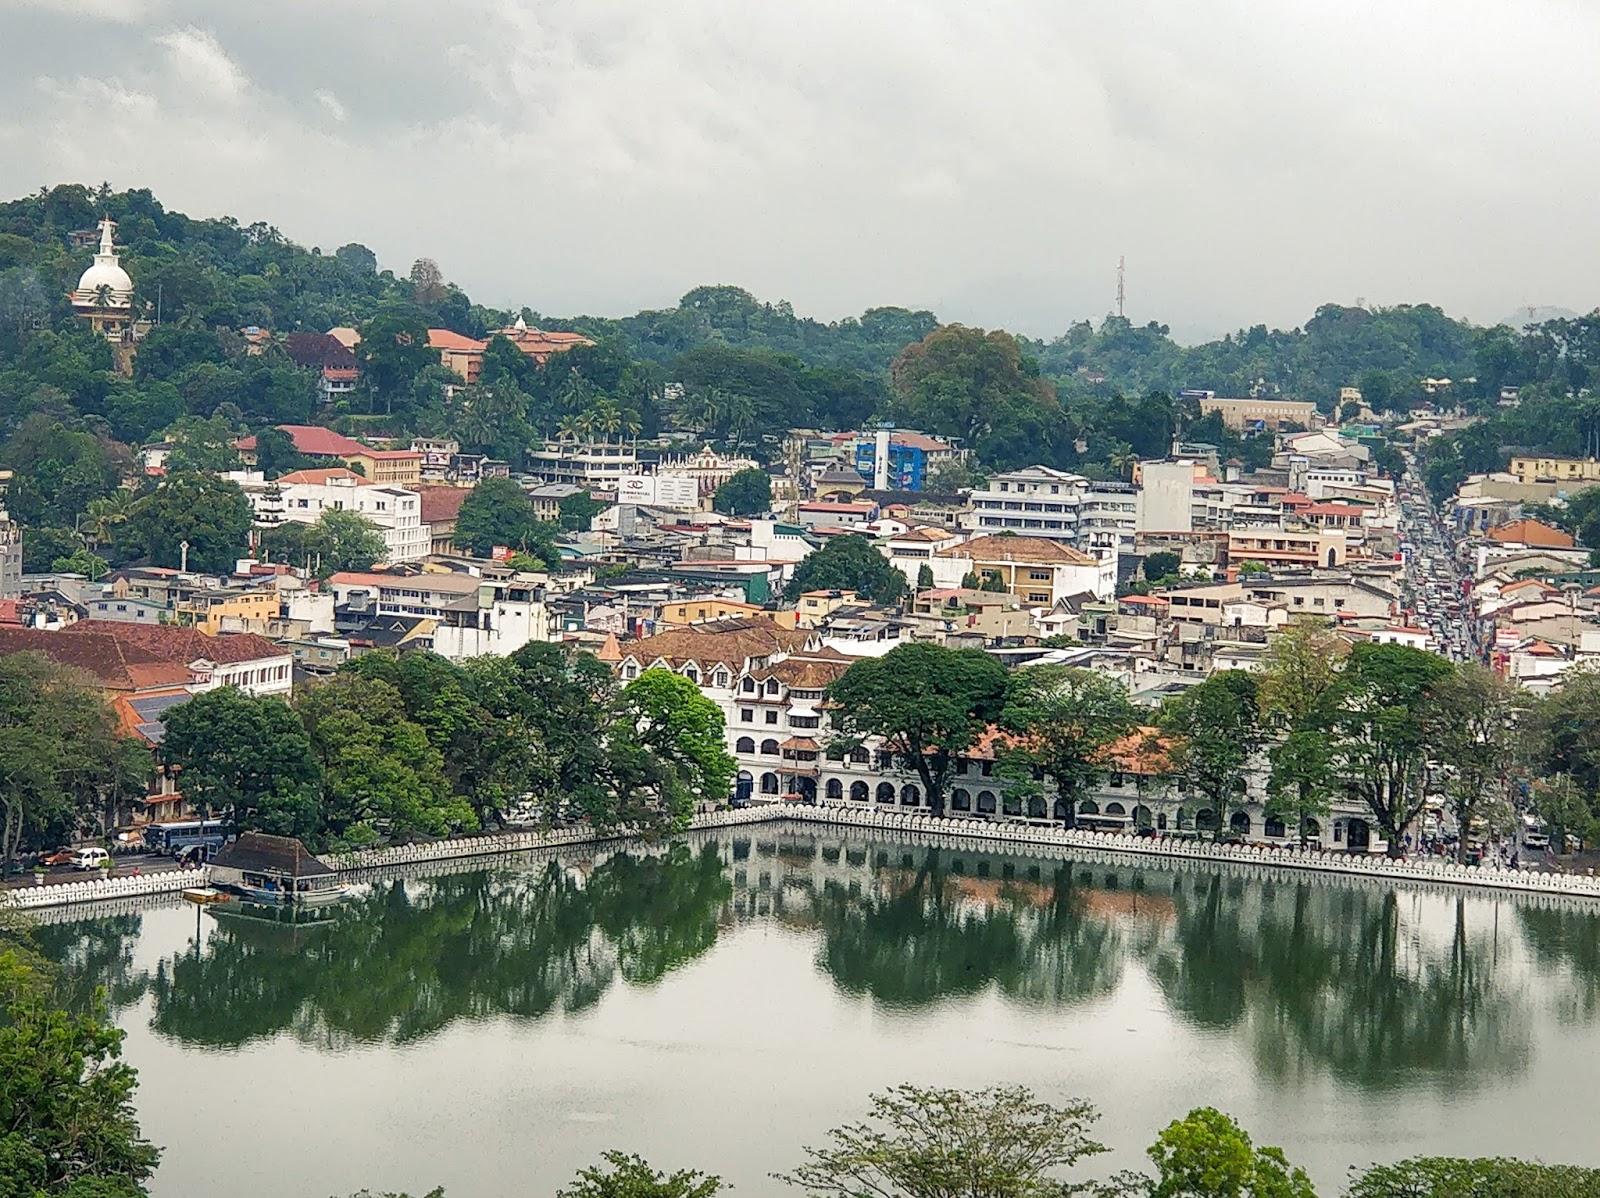 Kandy Lake as seen from the Upper Lake Drive, Kandy, Sri Lanka